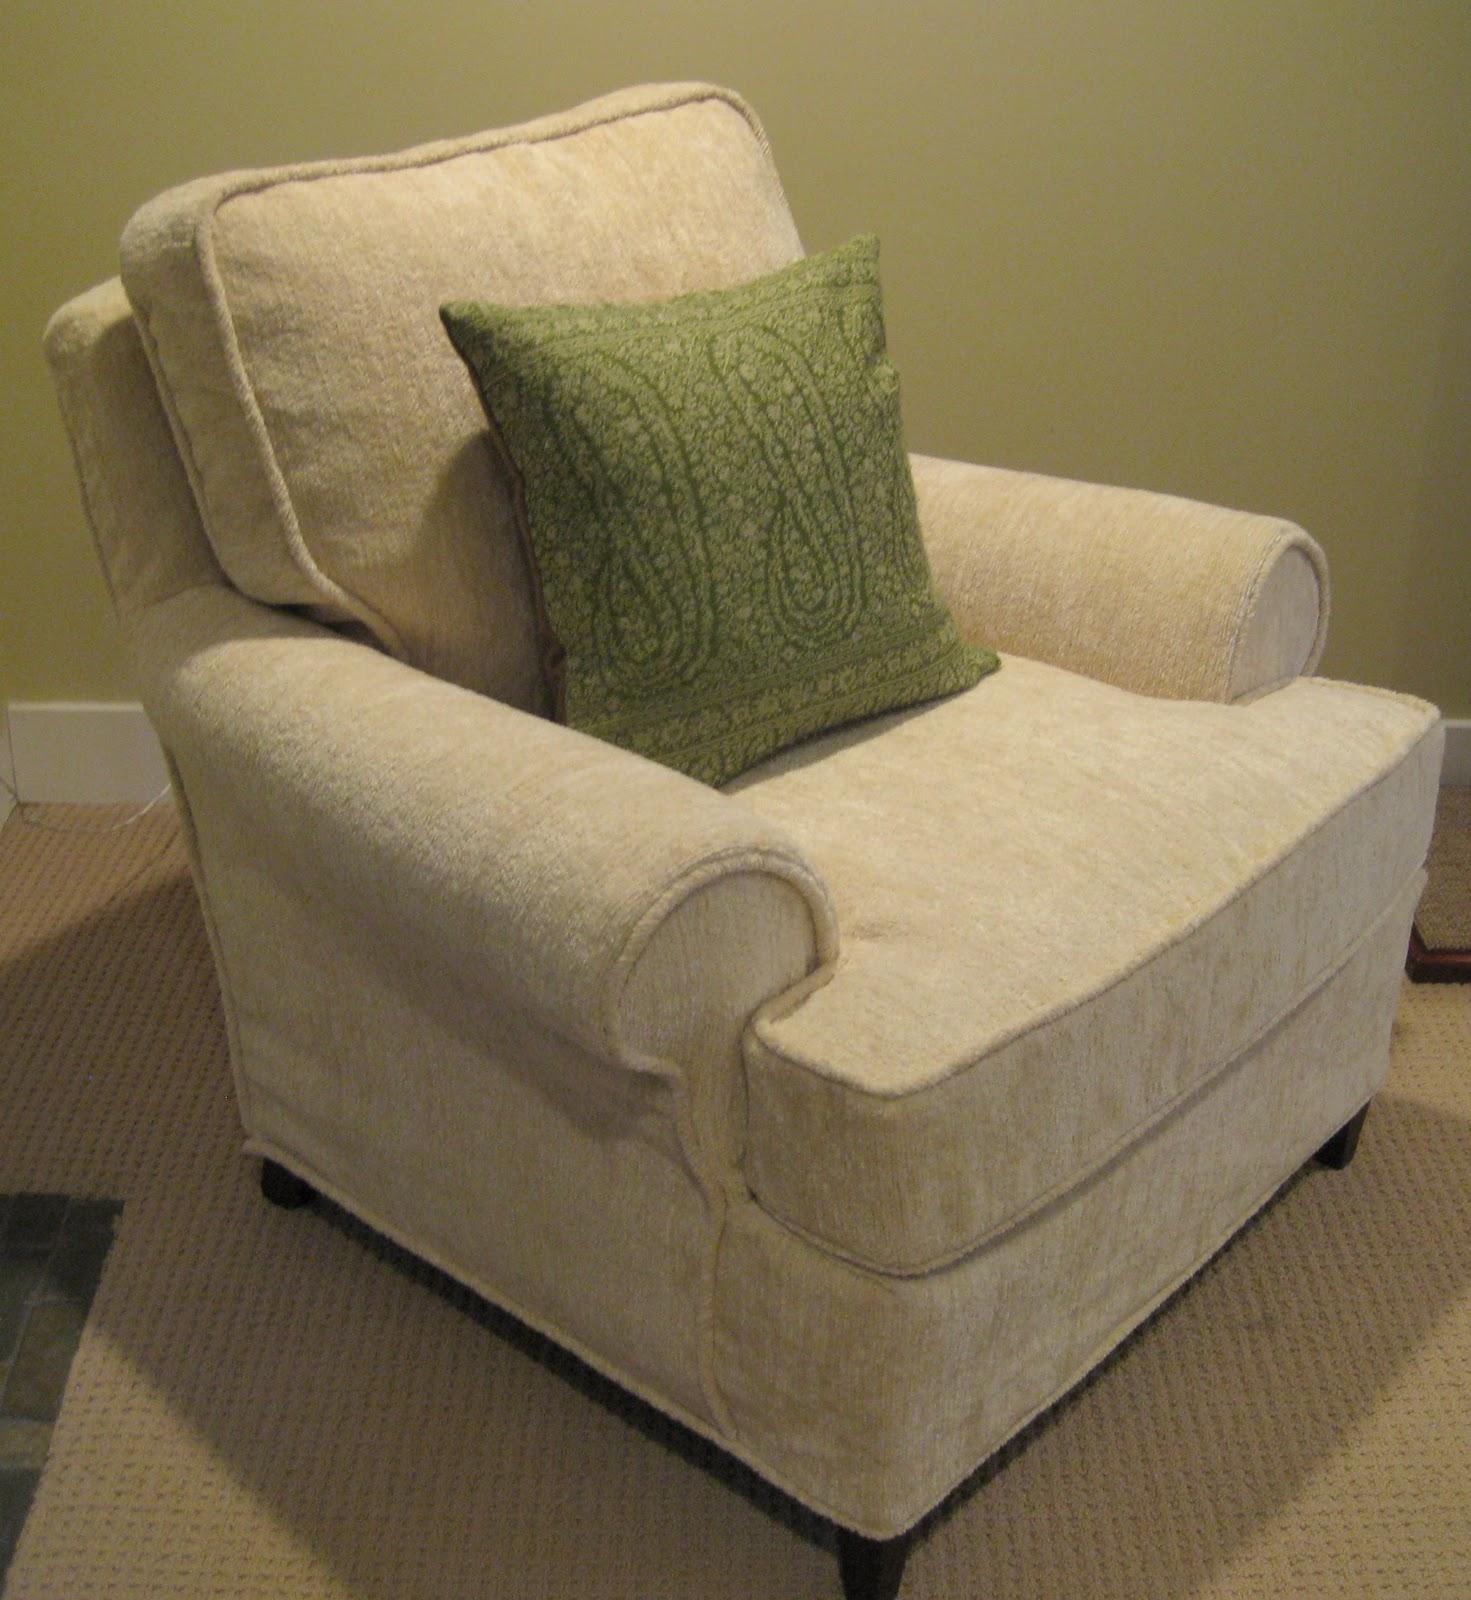 Custom Slipcovers by Shelley: Club chair